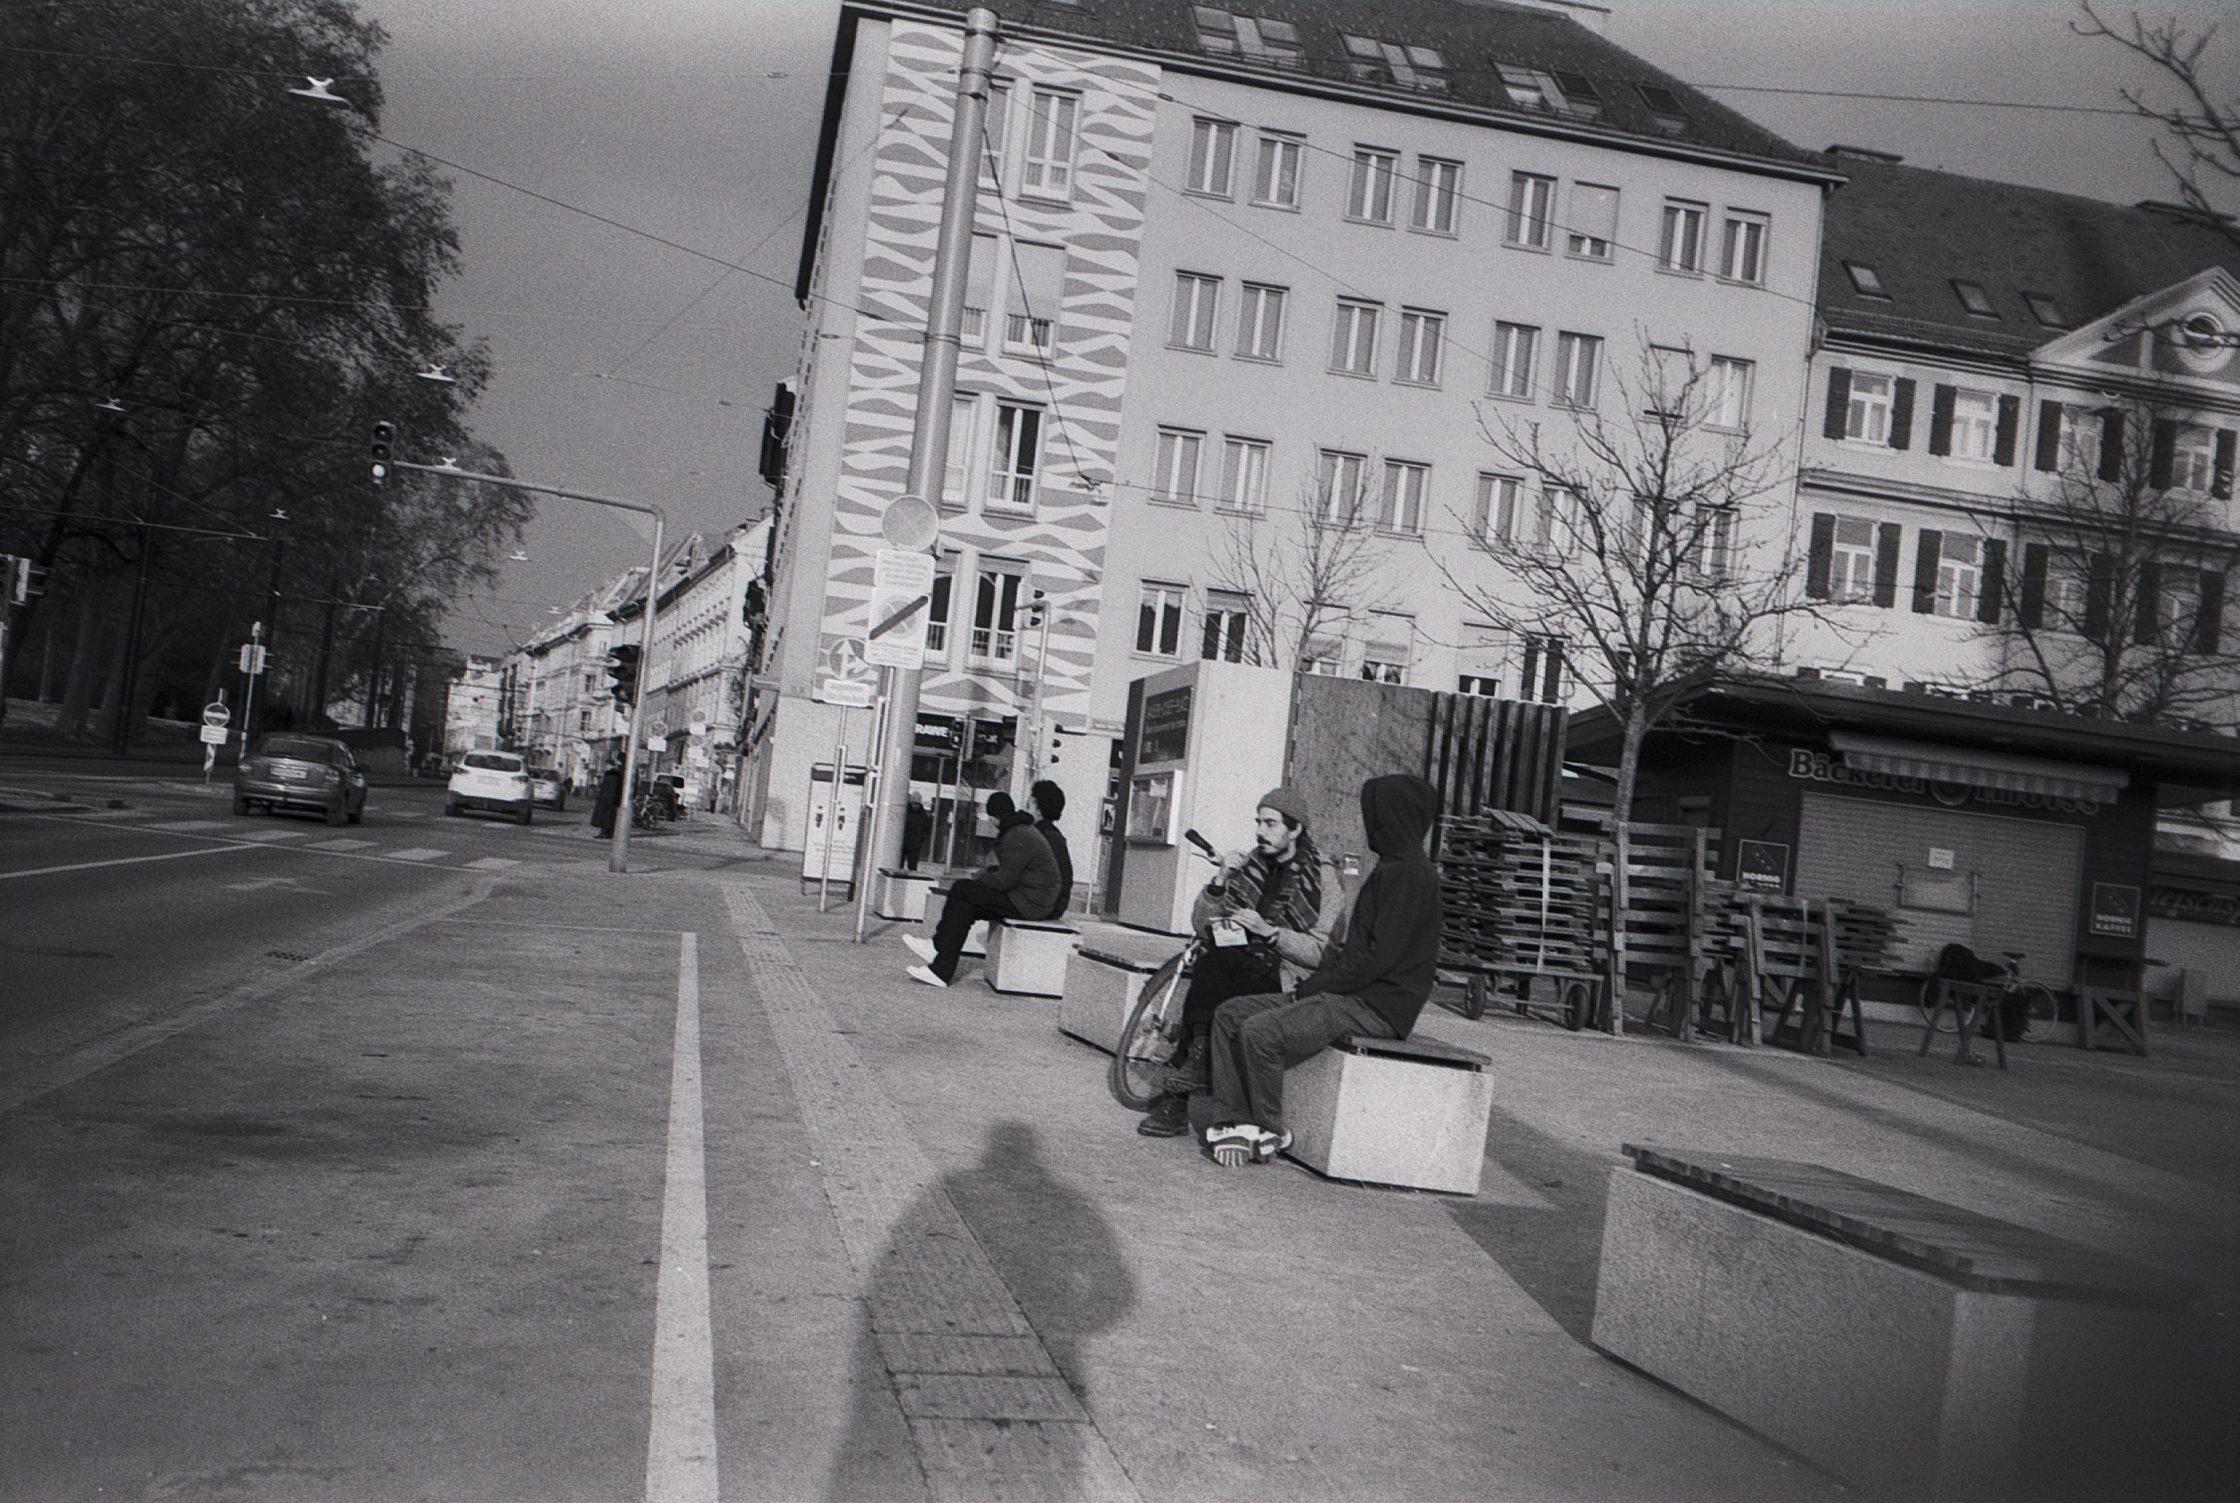 #022 Film per day – Kaiser Josef Platz